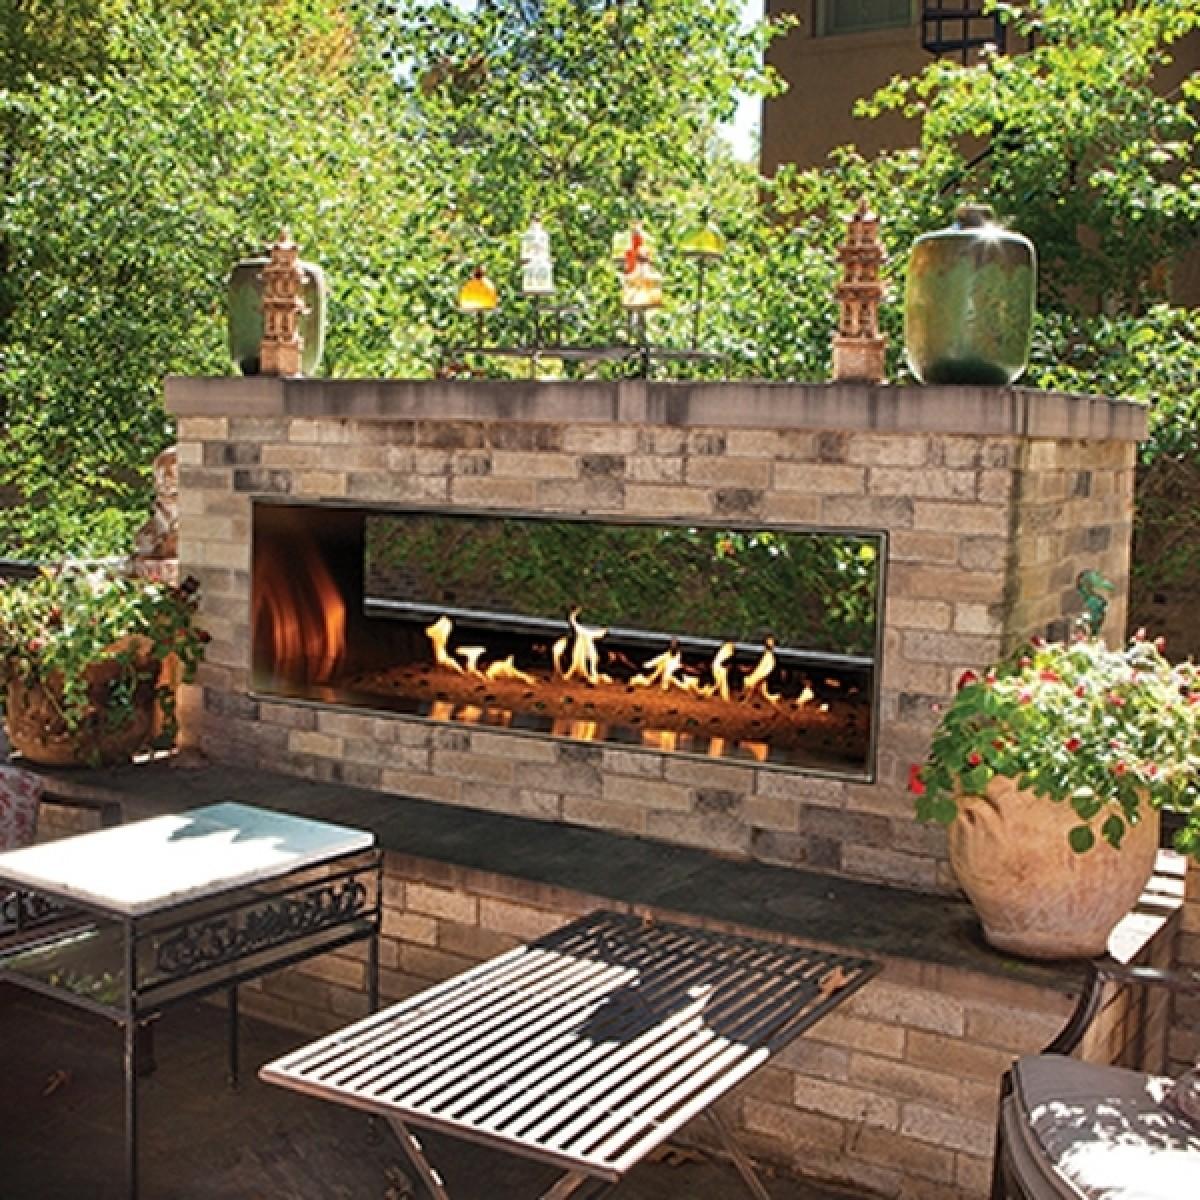 fireplace com hearth home lp media forums talk full inside